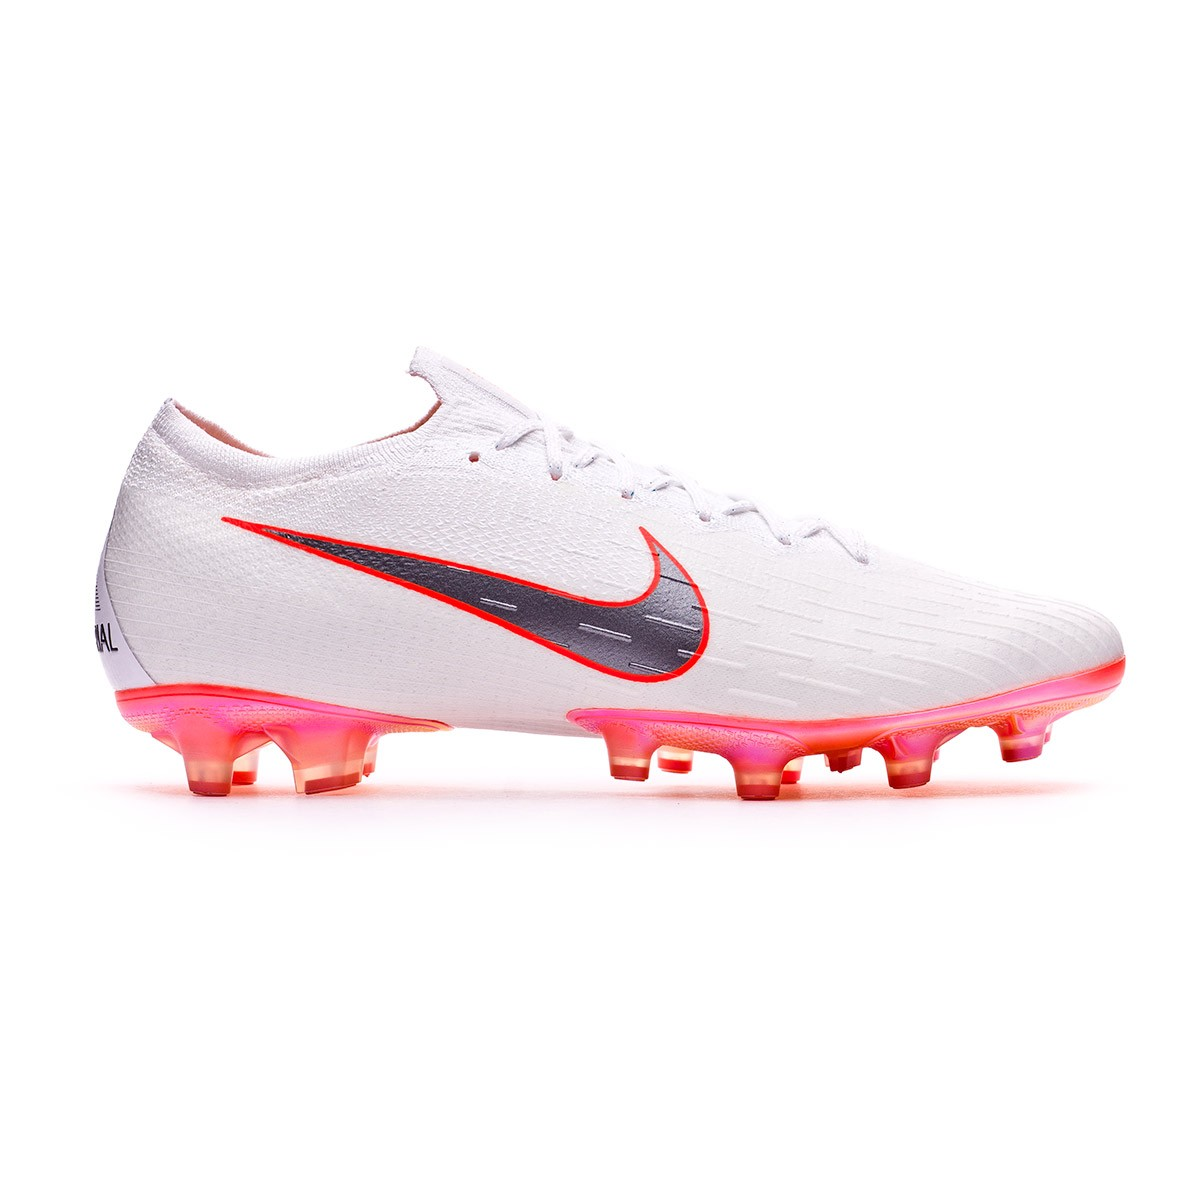 low priced f19c5 5a5a2 Football Boots Nike Mercurial Vapor XII Elite AG-Pro White-Metallic cool  grey-Total orange - Football store Fútbol Emotion